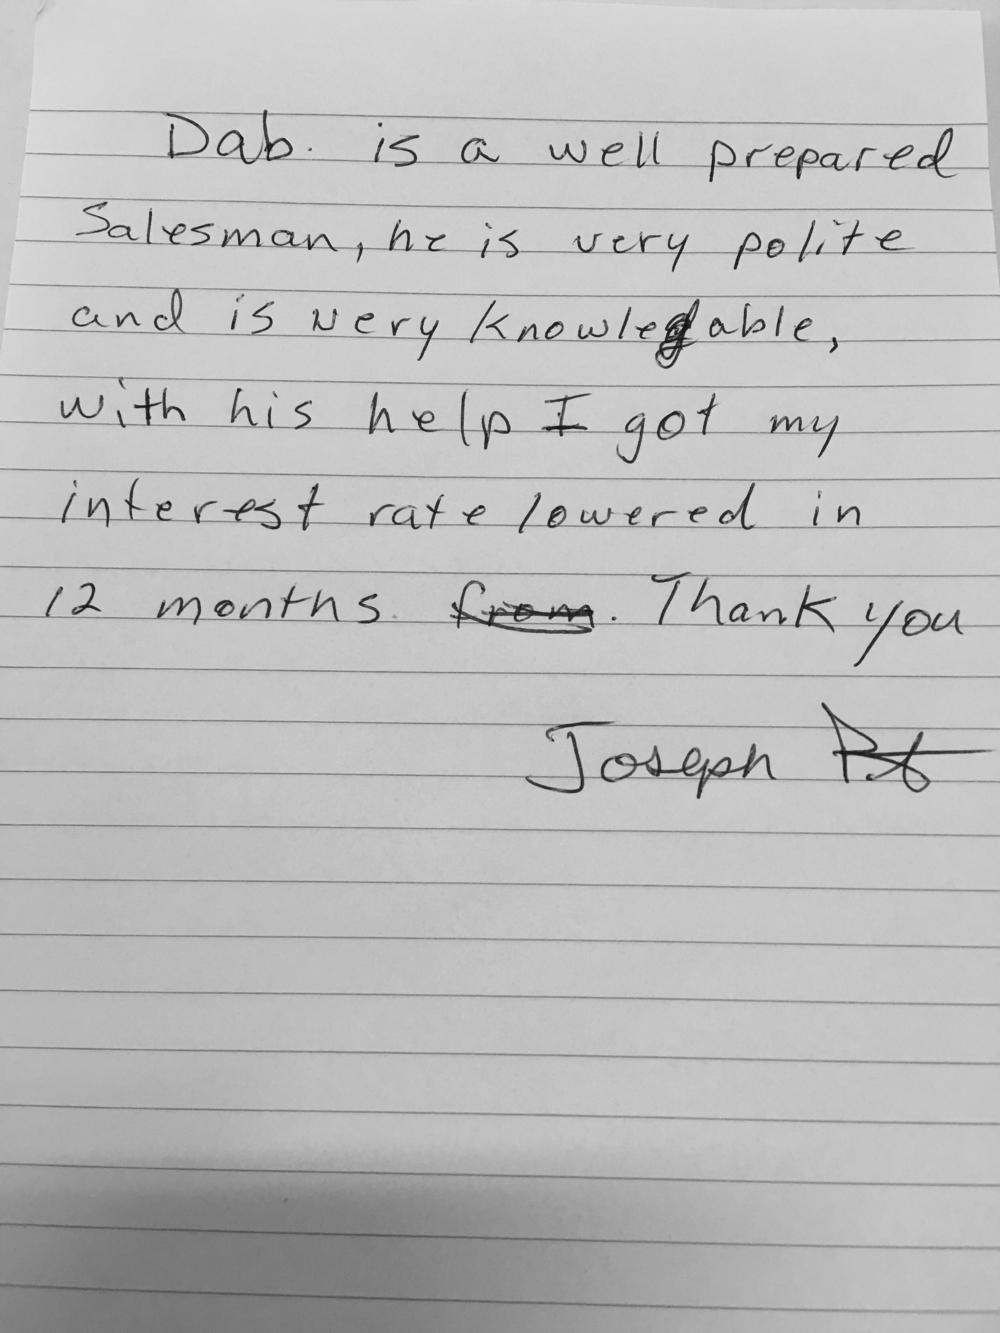 Joseph Pitre_Testimonial.jpg